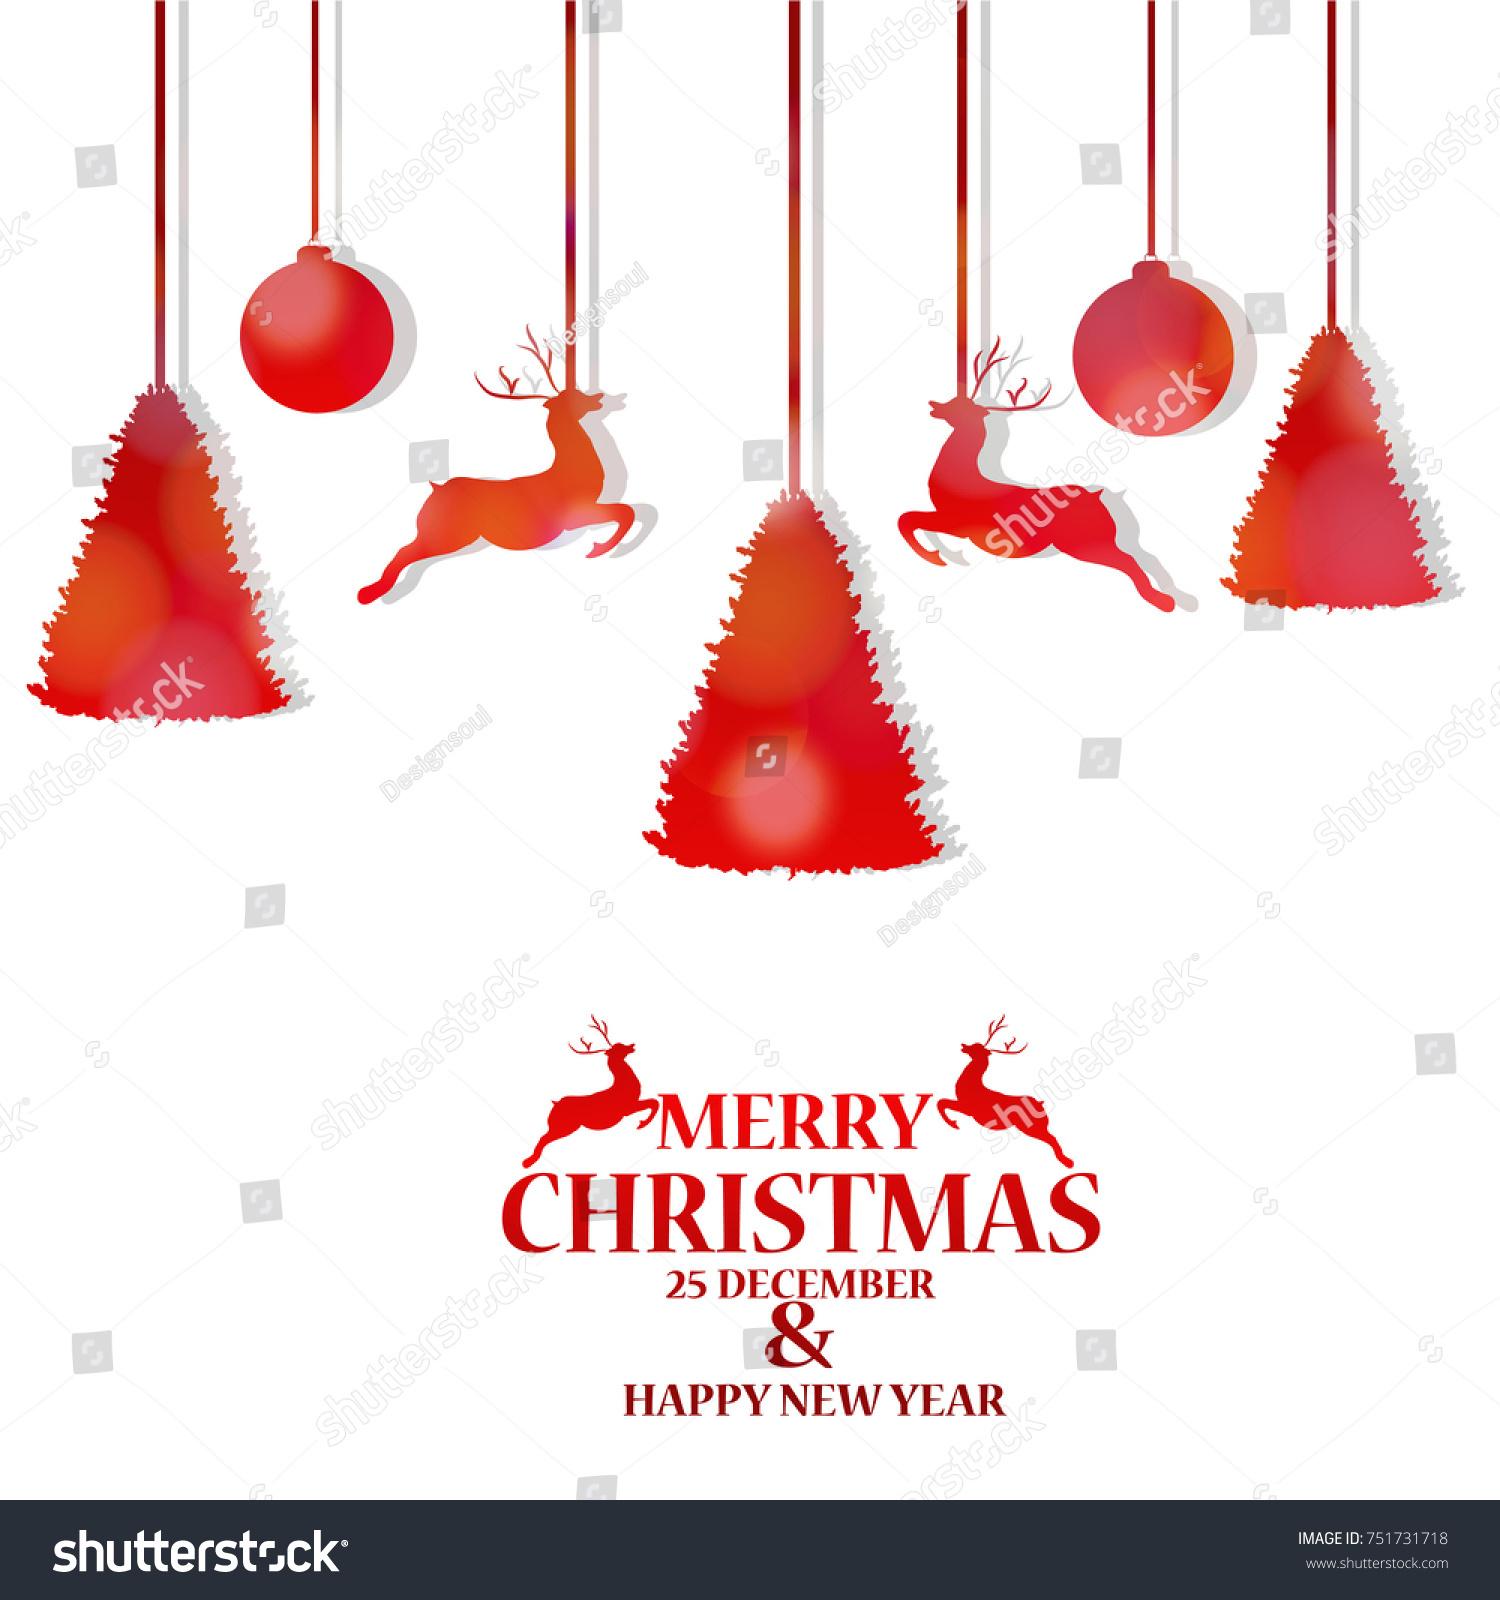 Merry Christmas Christmas Celebrates Birth Jesus Stock Vector ...